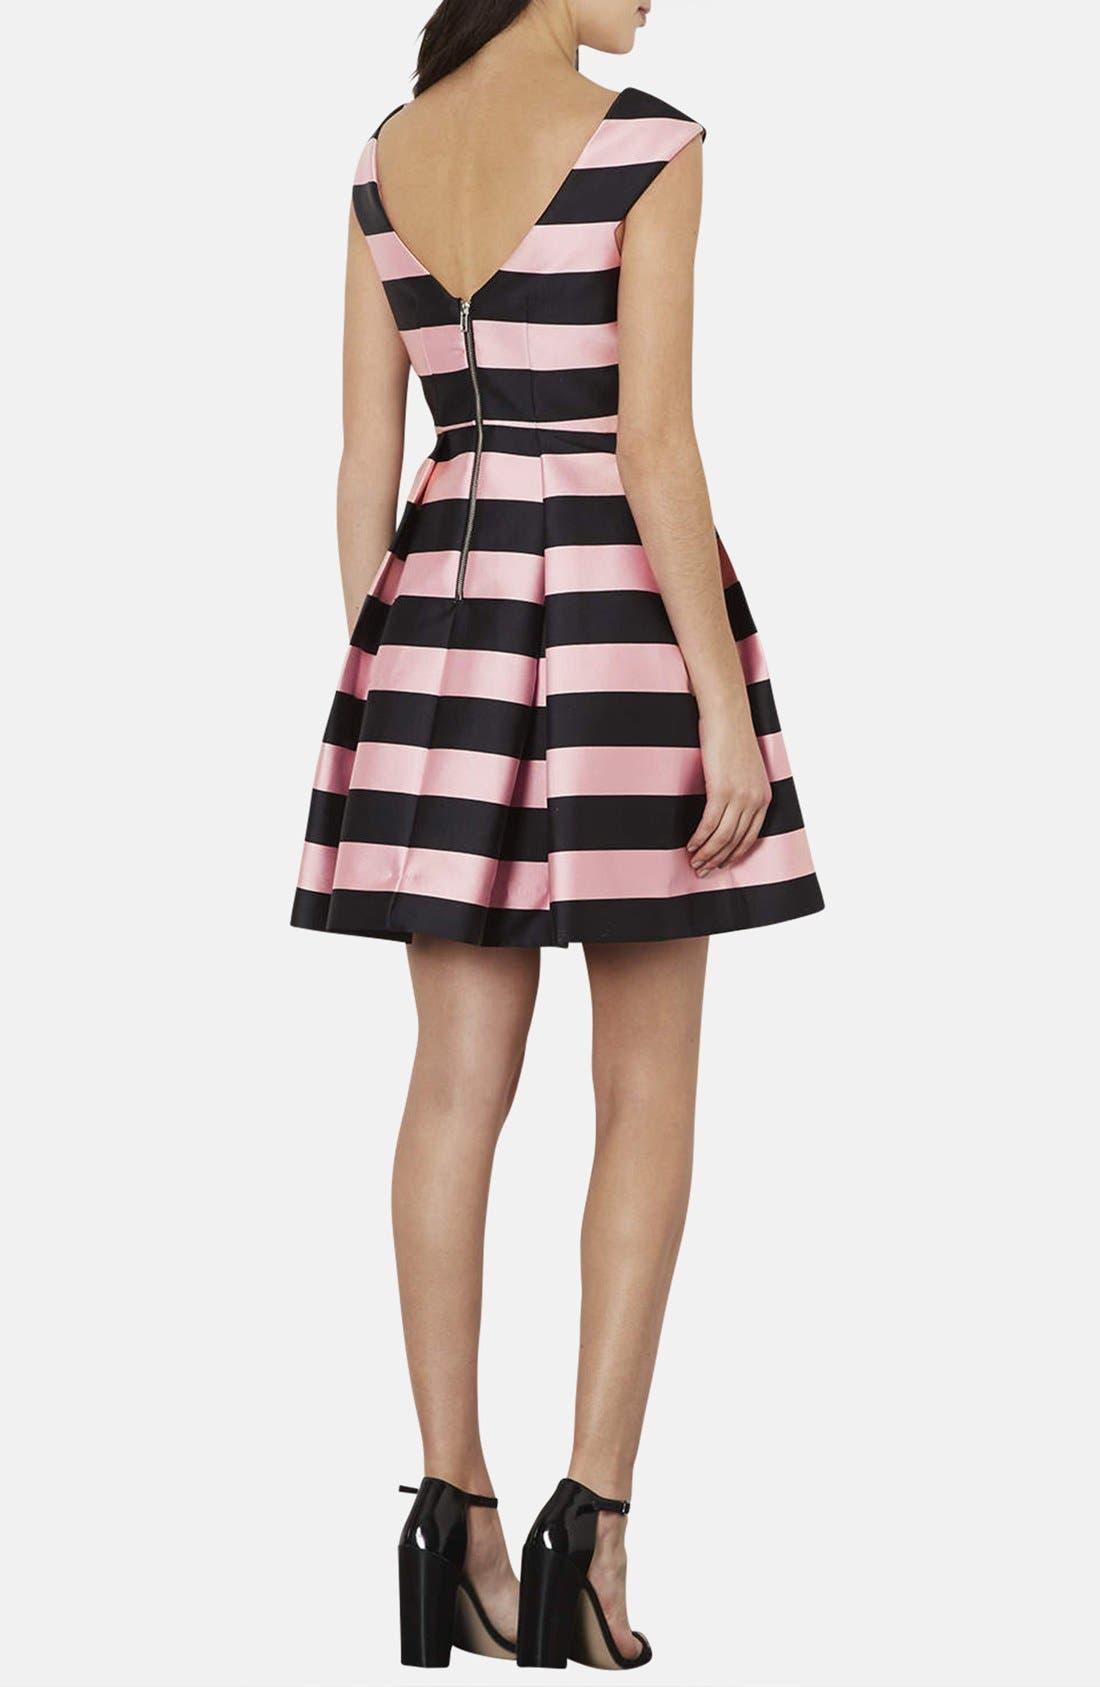 TOPSHOP, Stripe Satin Fit & Flare Dress, Alternate thumbnail 2, color, 001